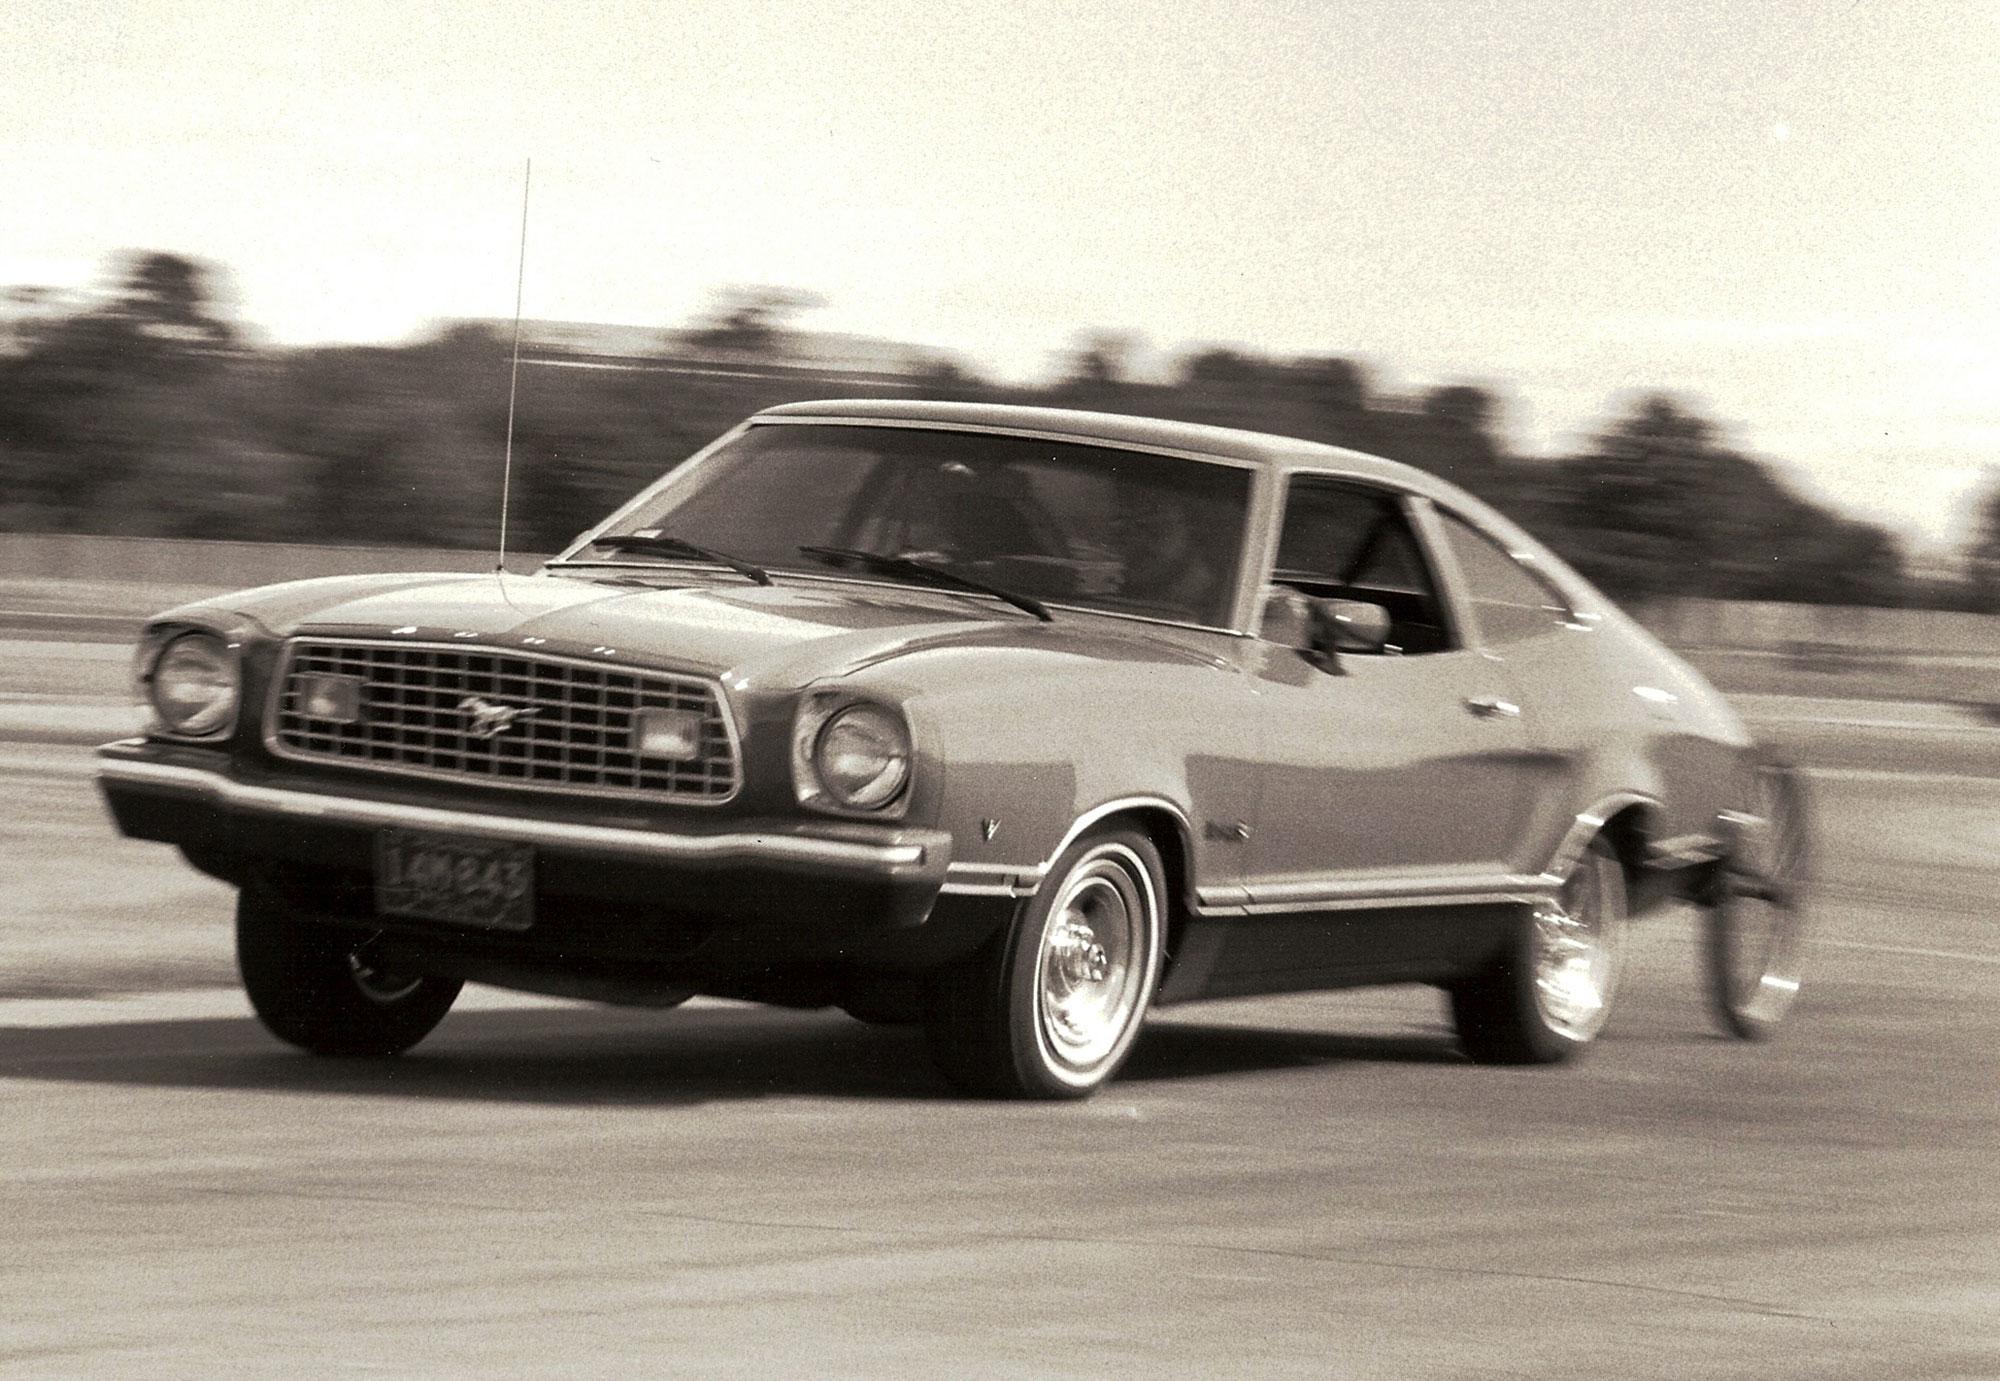 Mustang II road testing